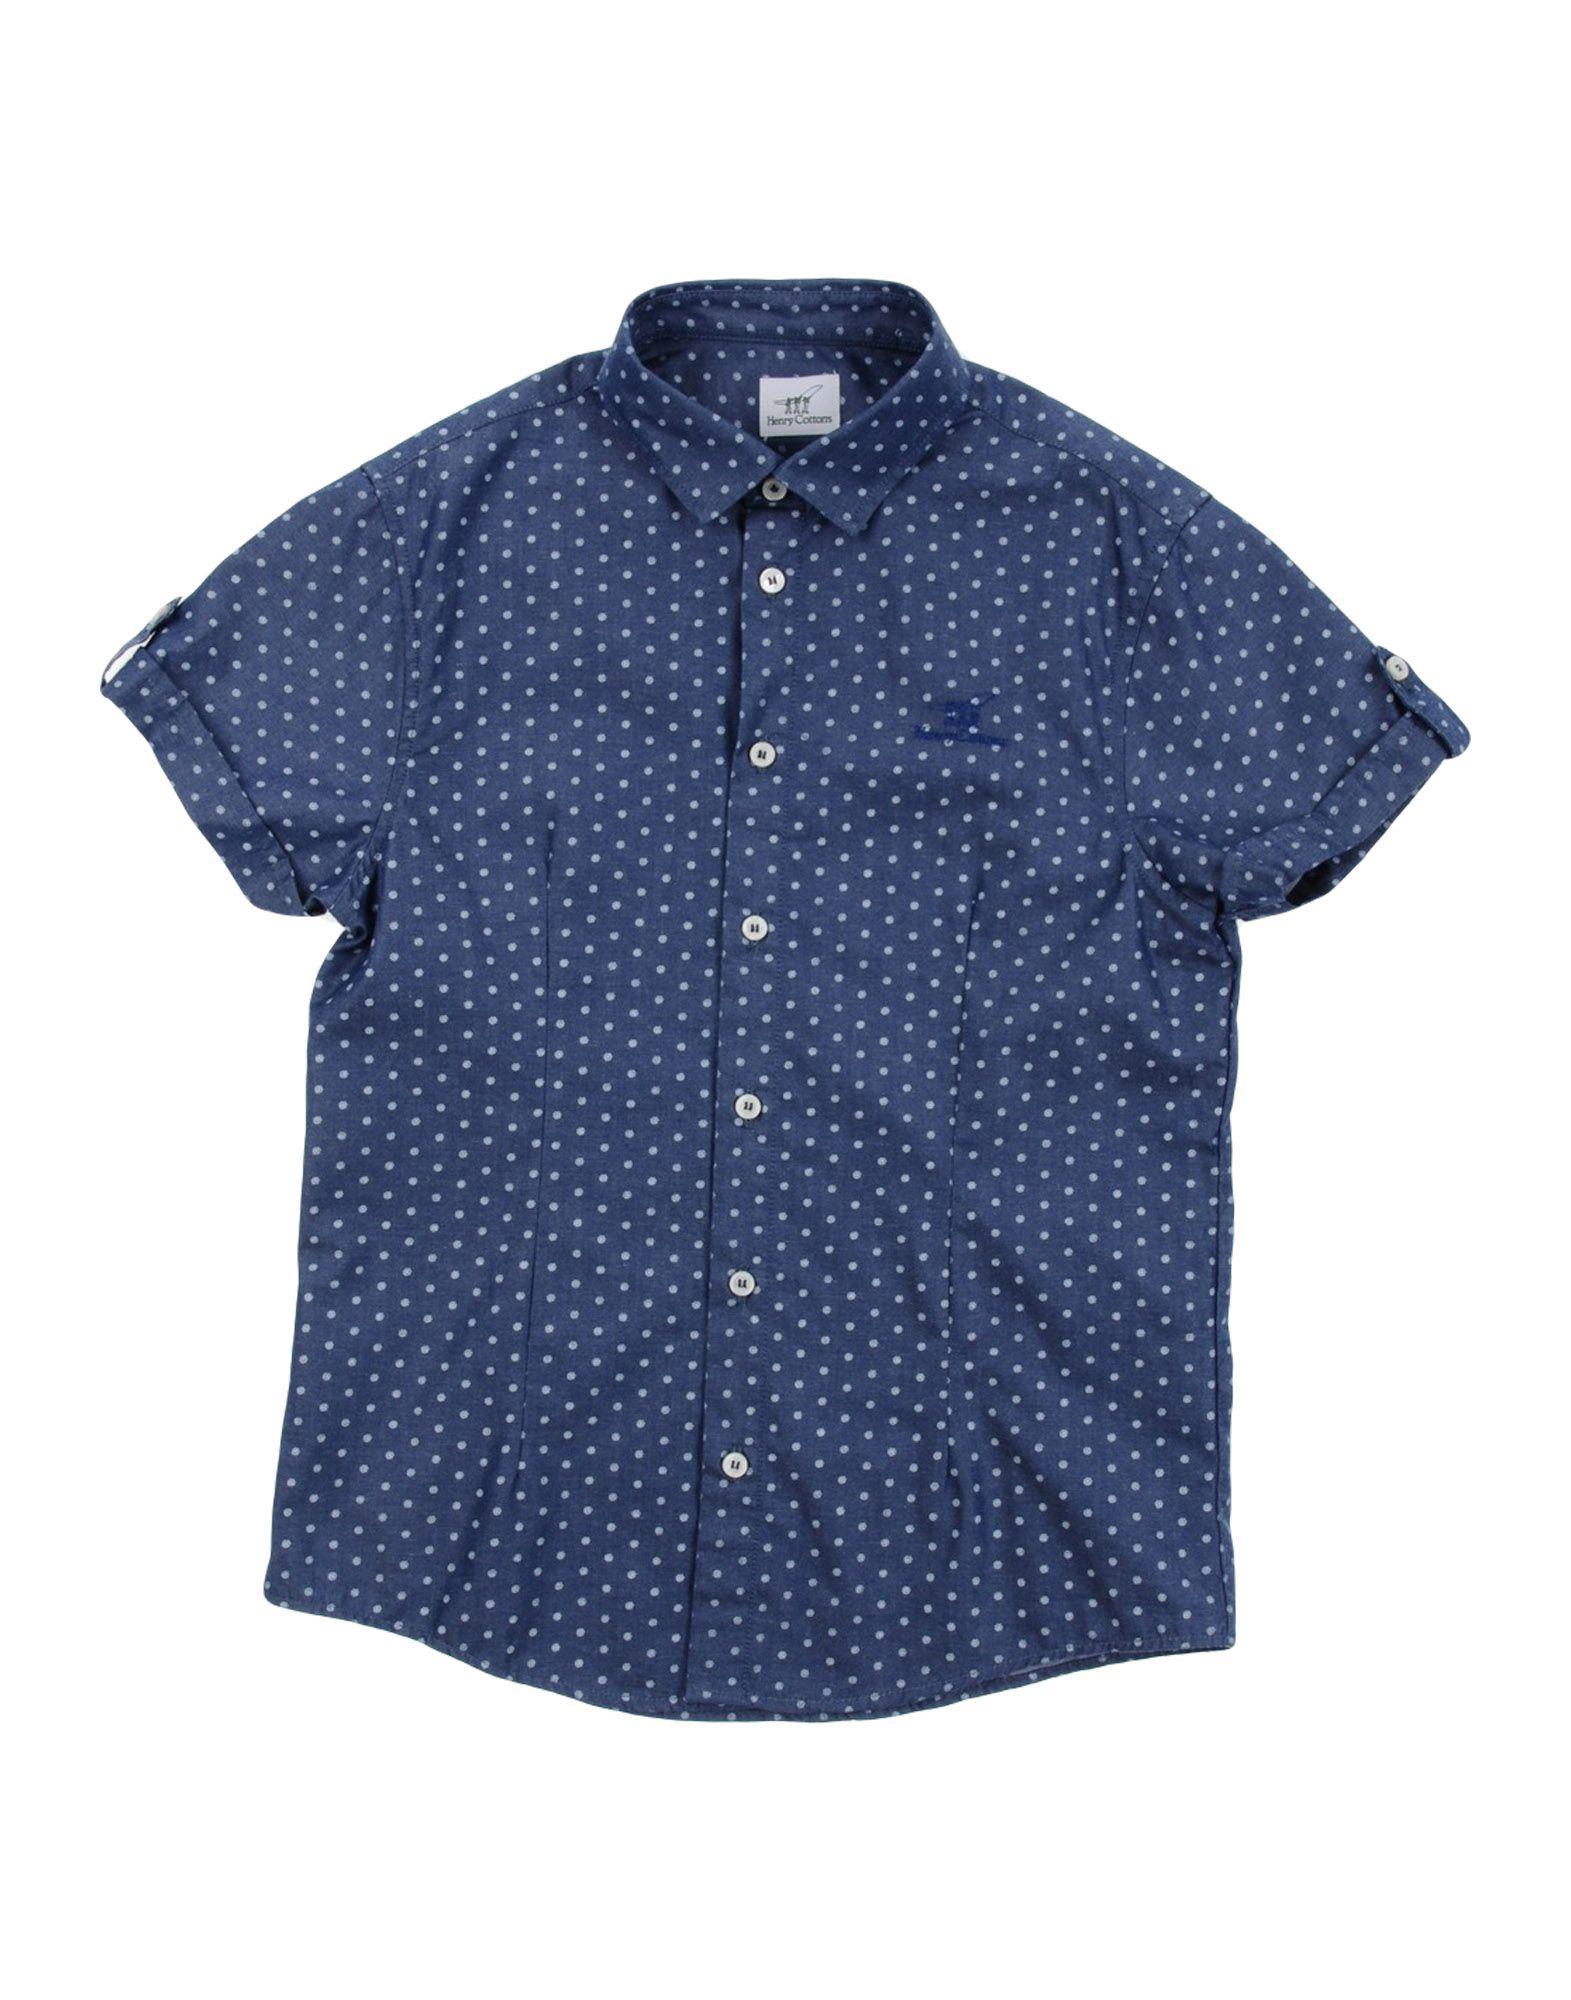 HENRY COTTONS Denim outerwear